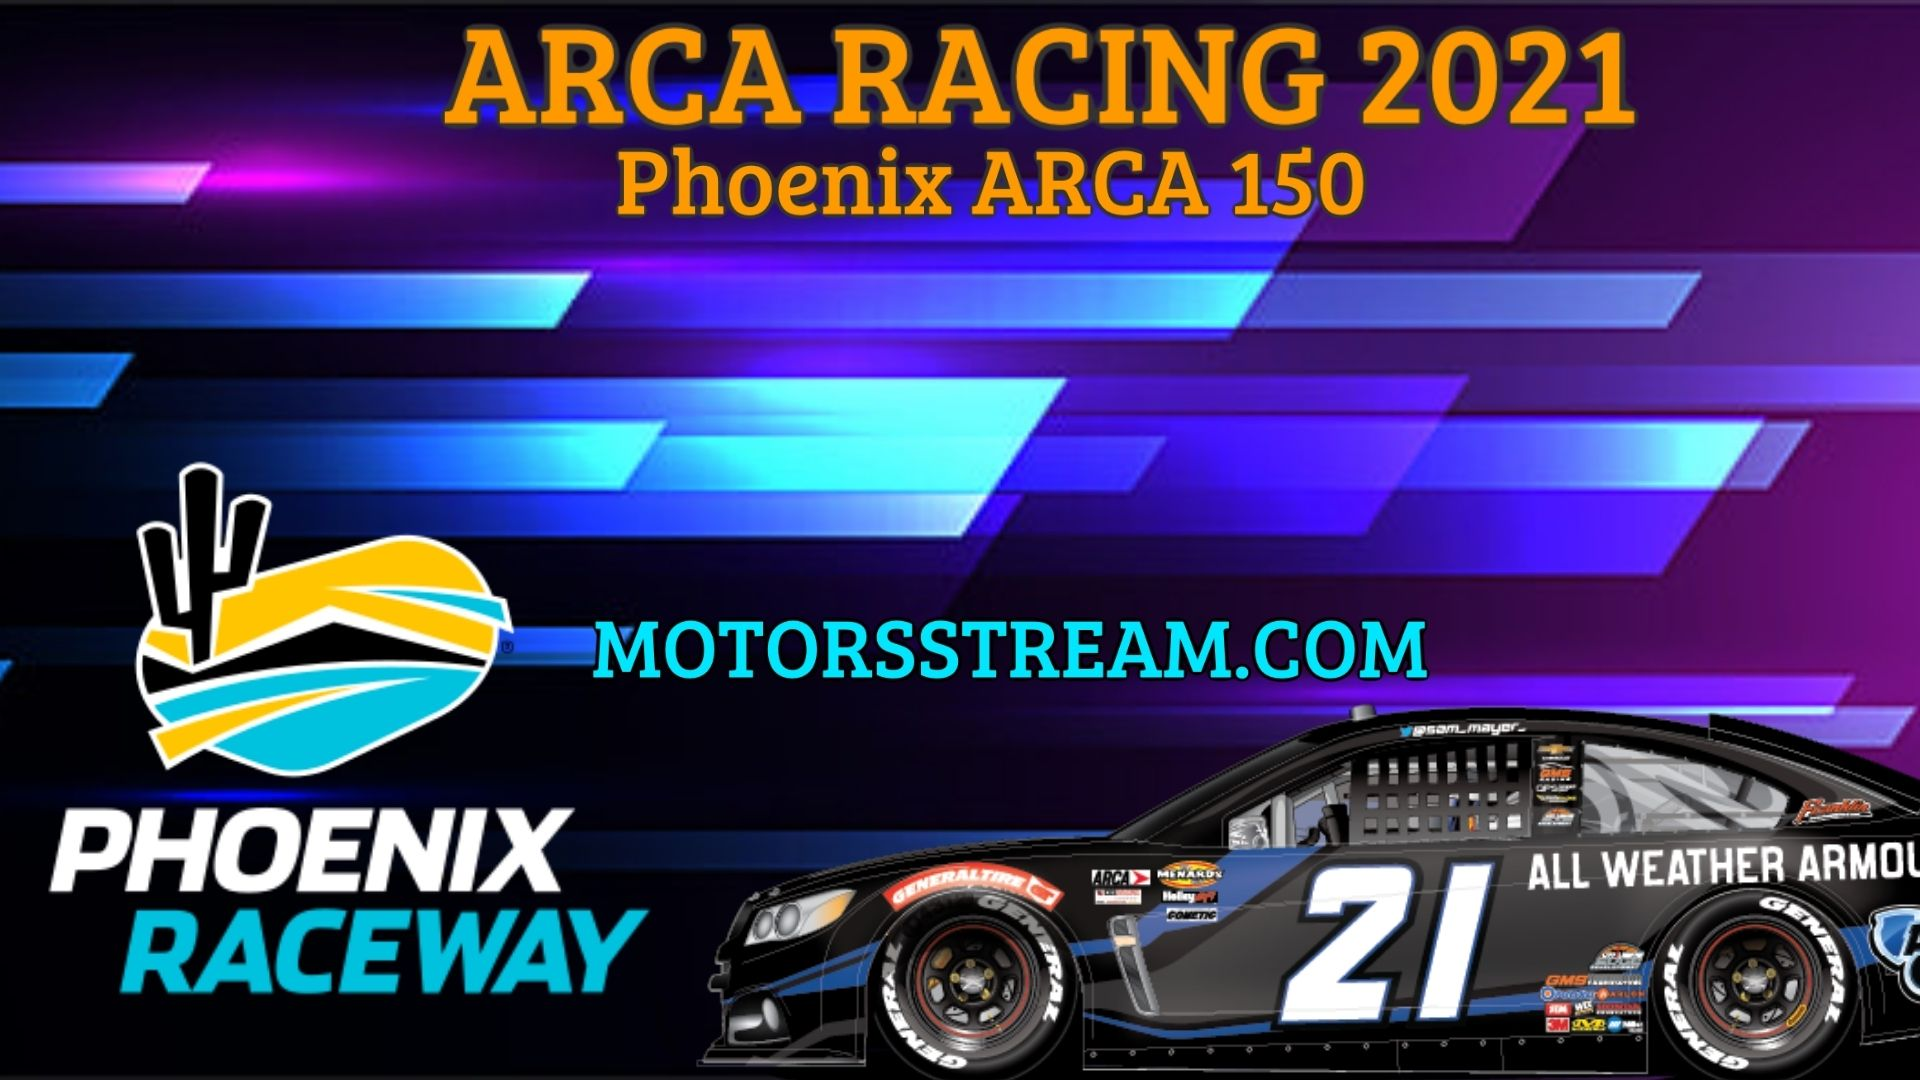 Phoenix ARCA 150 Live Stream 2021 Arca Racing